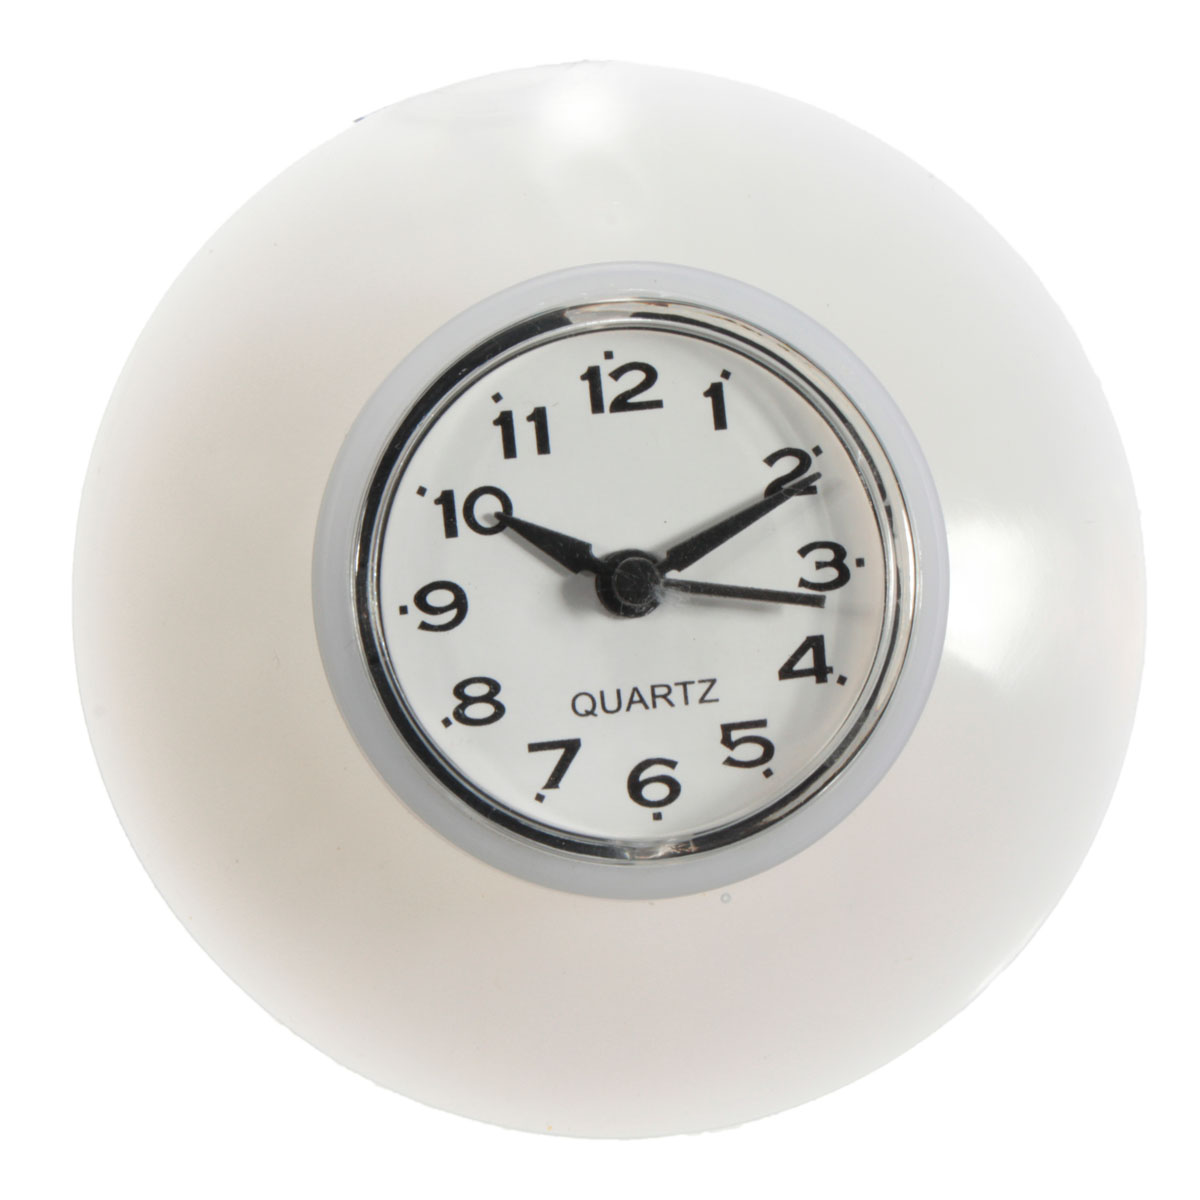 Bathroom Waterproof Wall Clock Resistant Timer Suction Cup | Alexnld.com